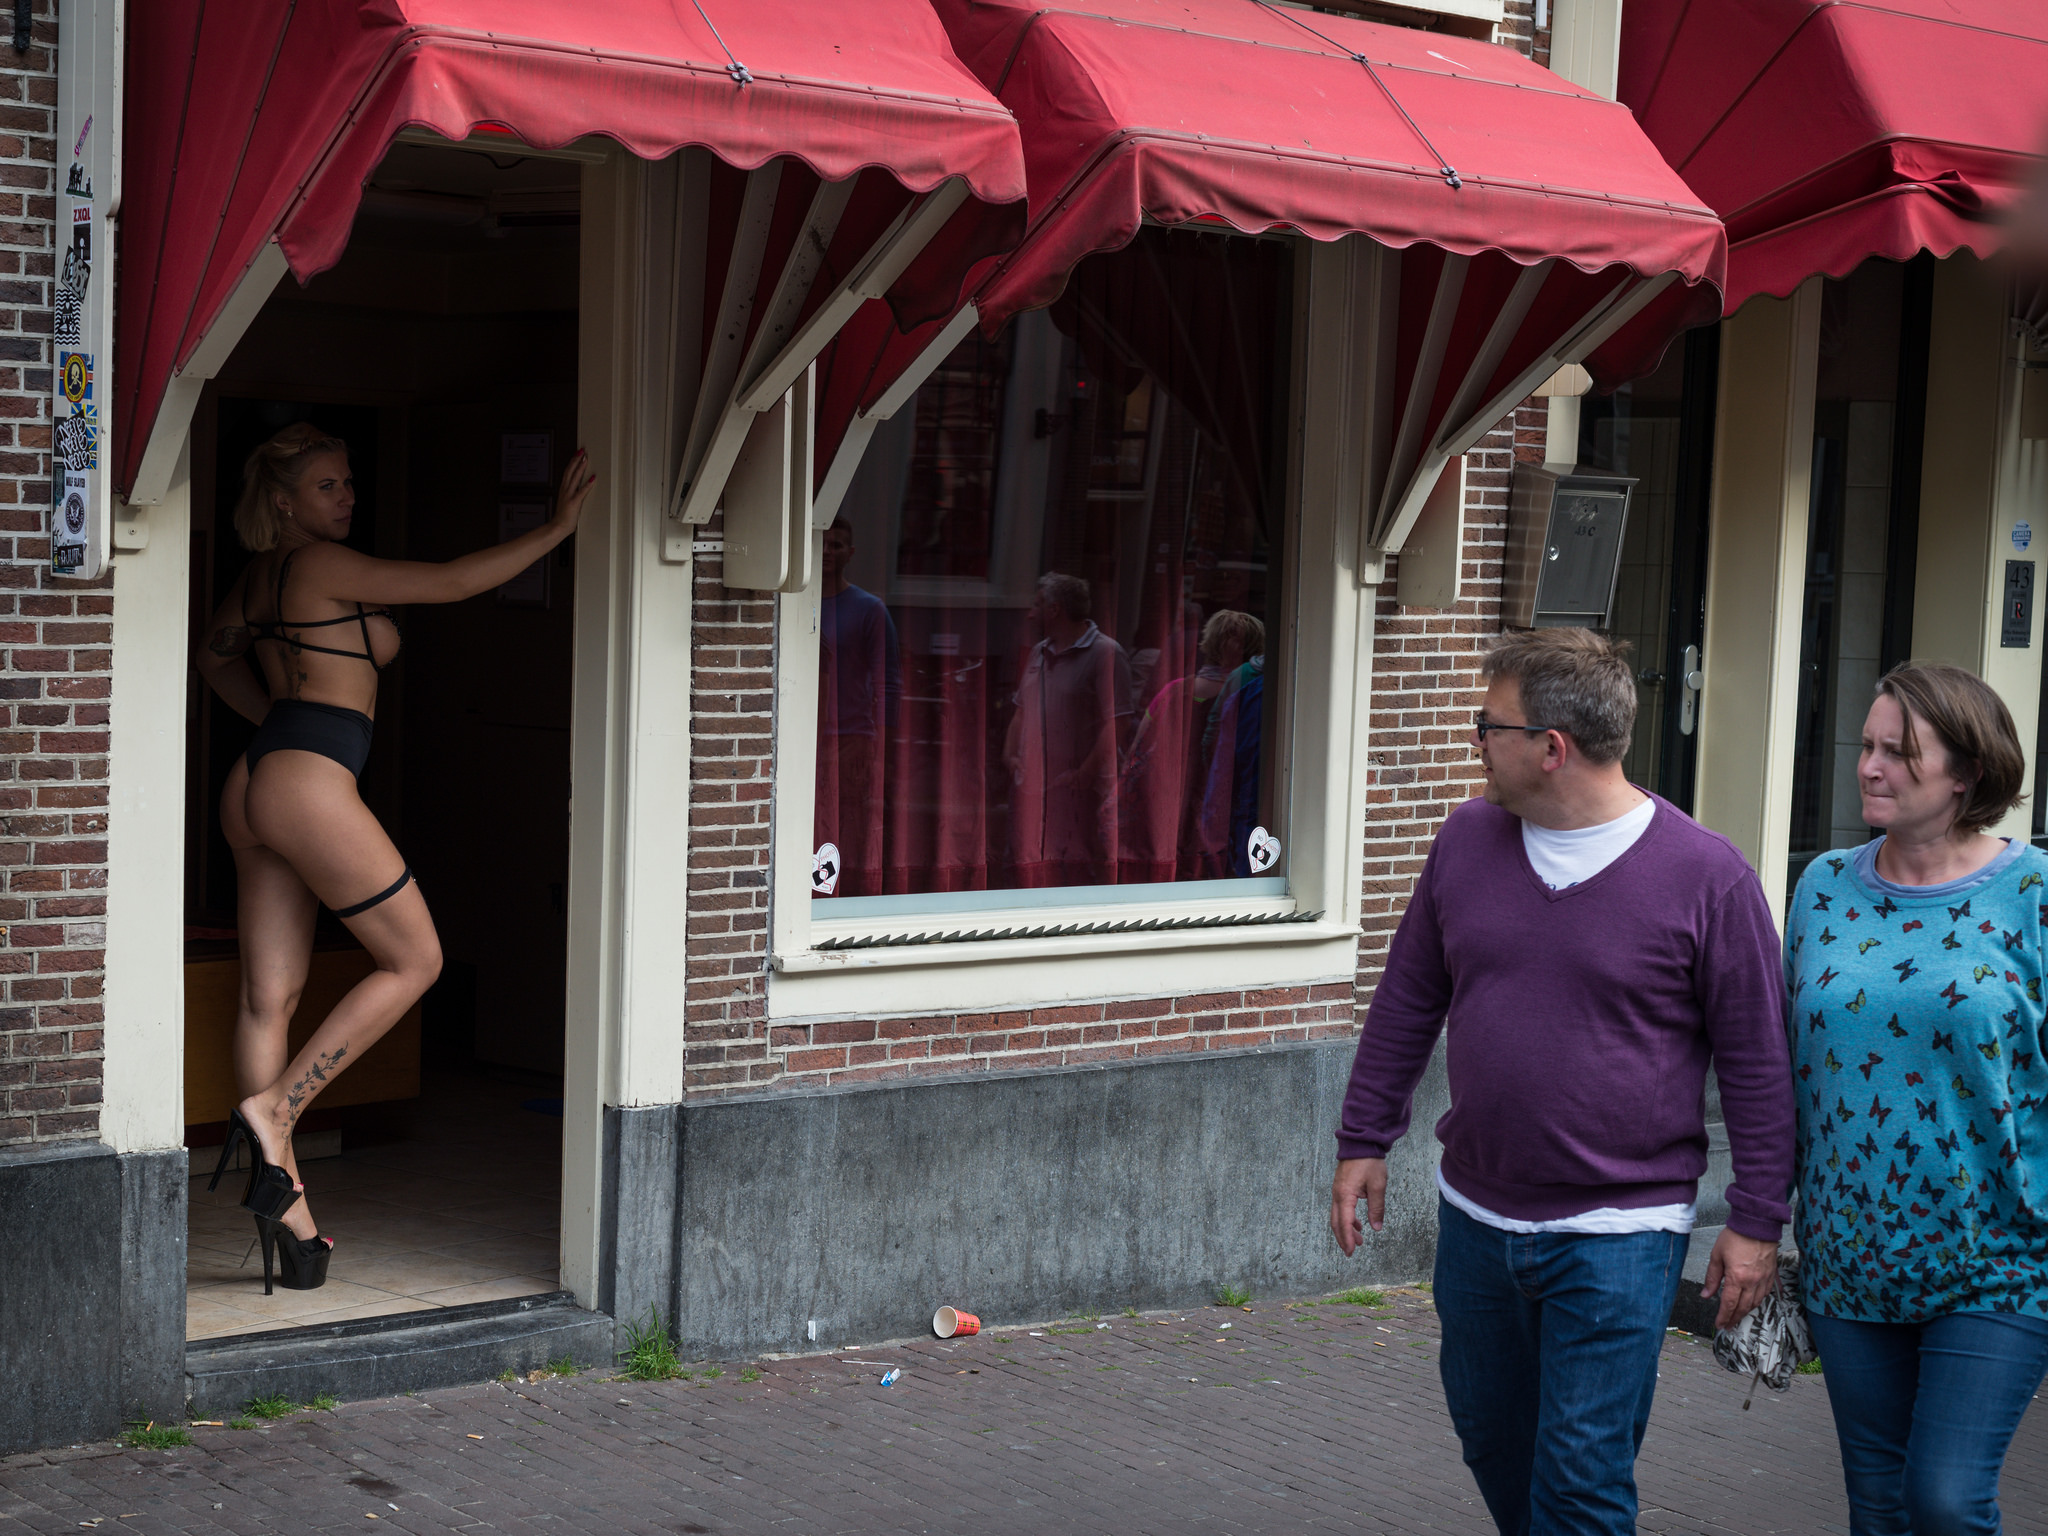 Секс на улица ру, Публично, на улице, Секс на природе - порно видео 19 фотография